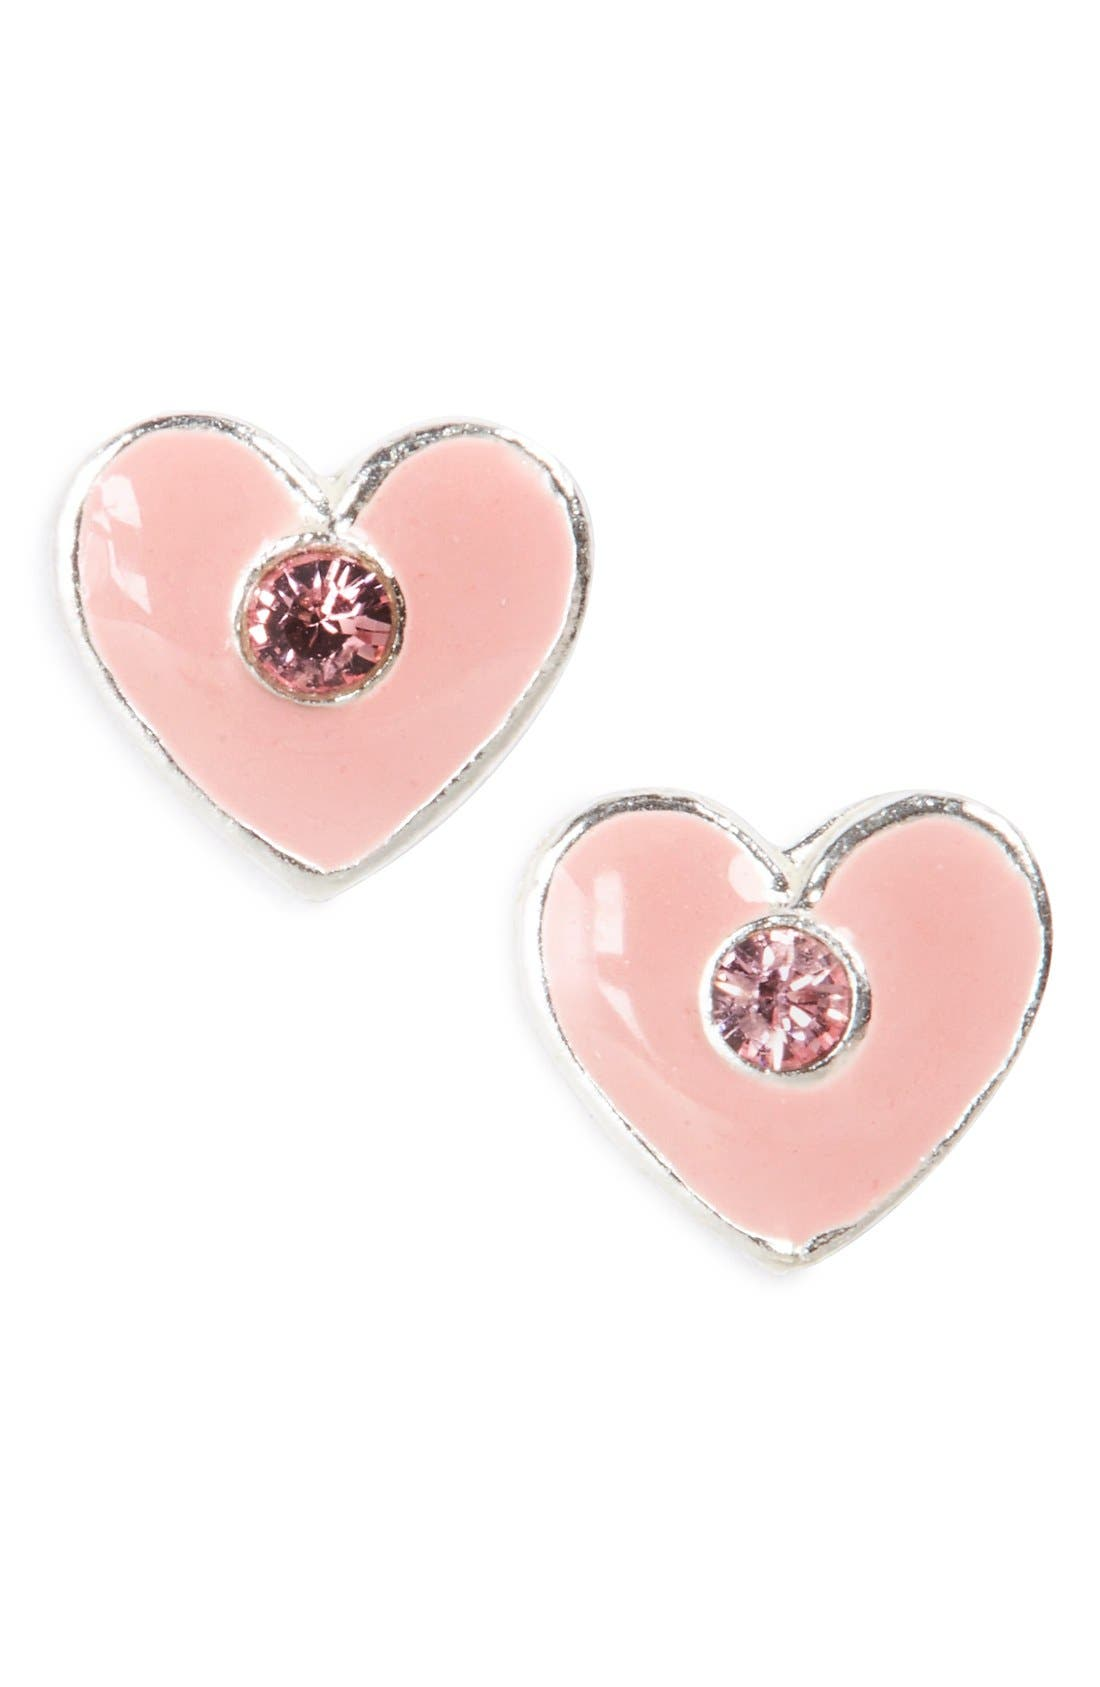 'Crystal Heart' Sterling Silver Stud Earrings,                             Main thumbnail 1, color,                             040